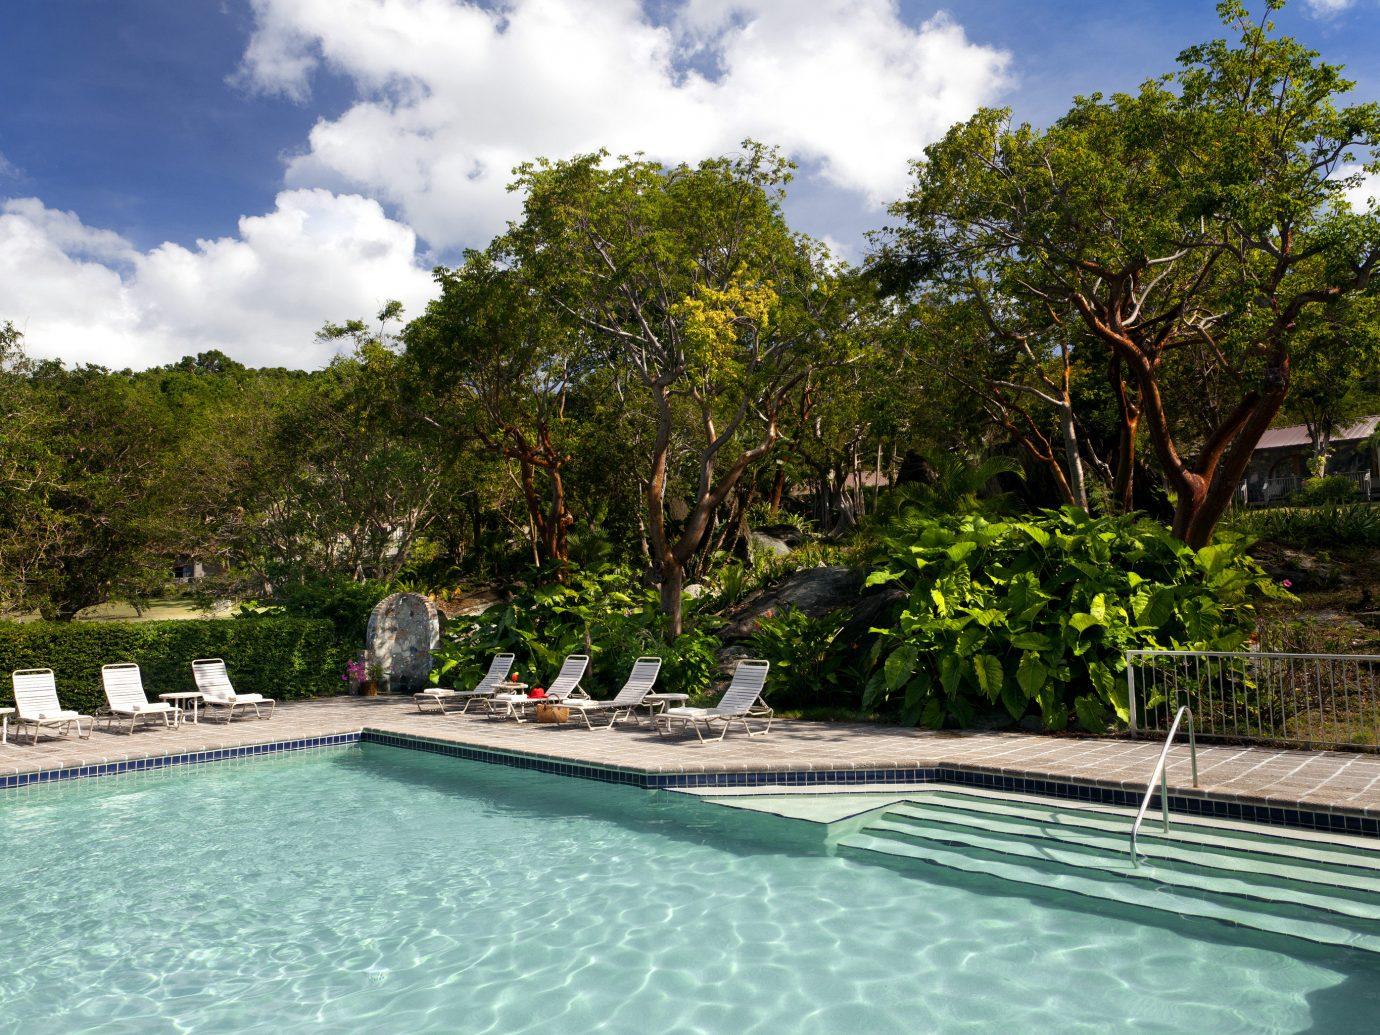 Eco Family Luxury Pool Resort Romantic Tropical tree swimming pool property reflecting pool Villa backyard